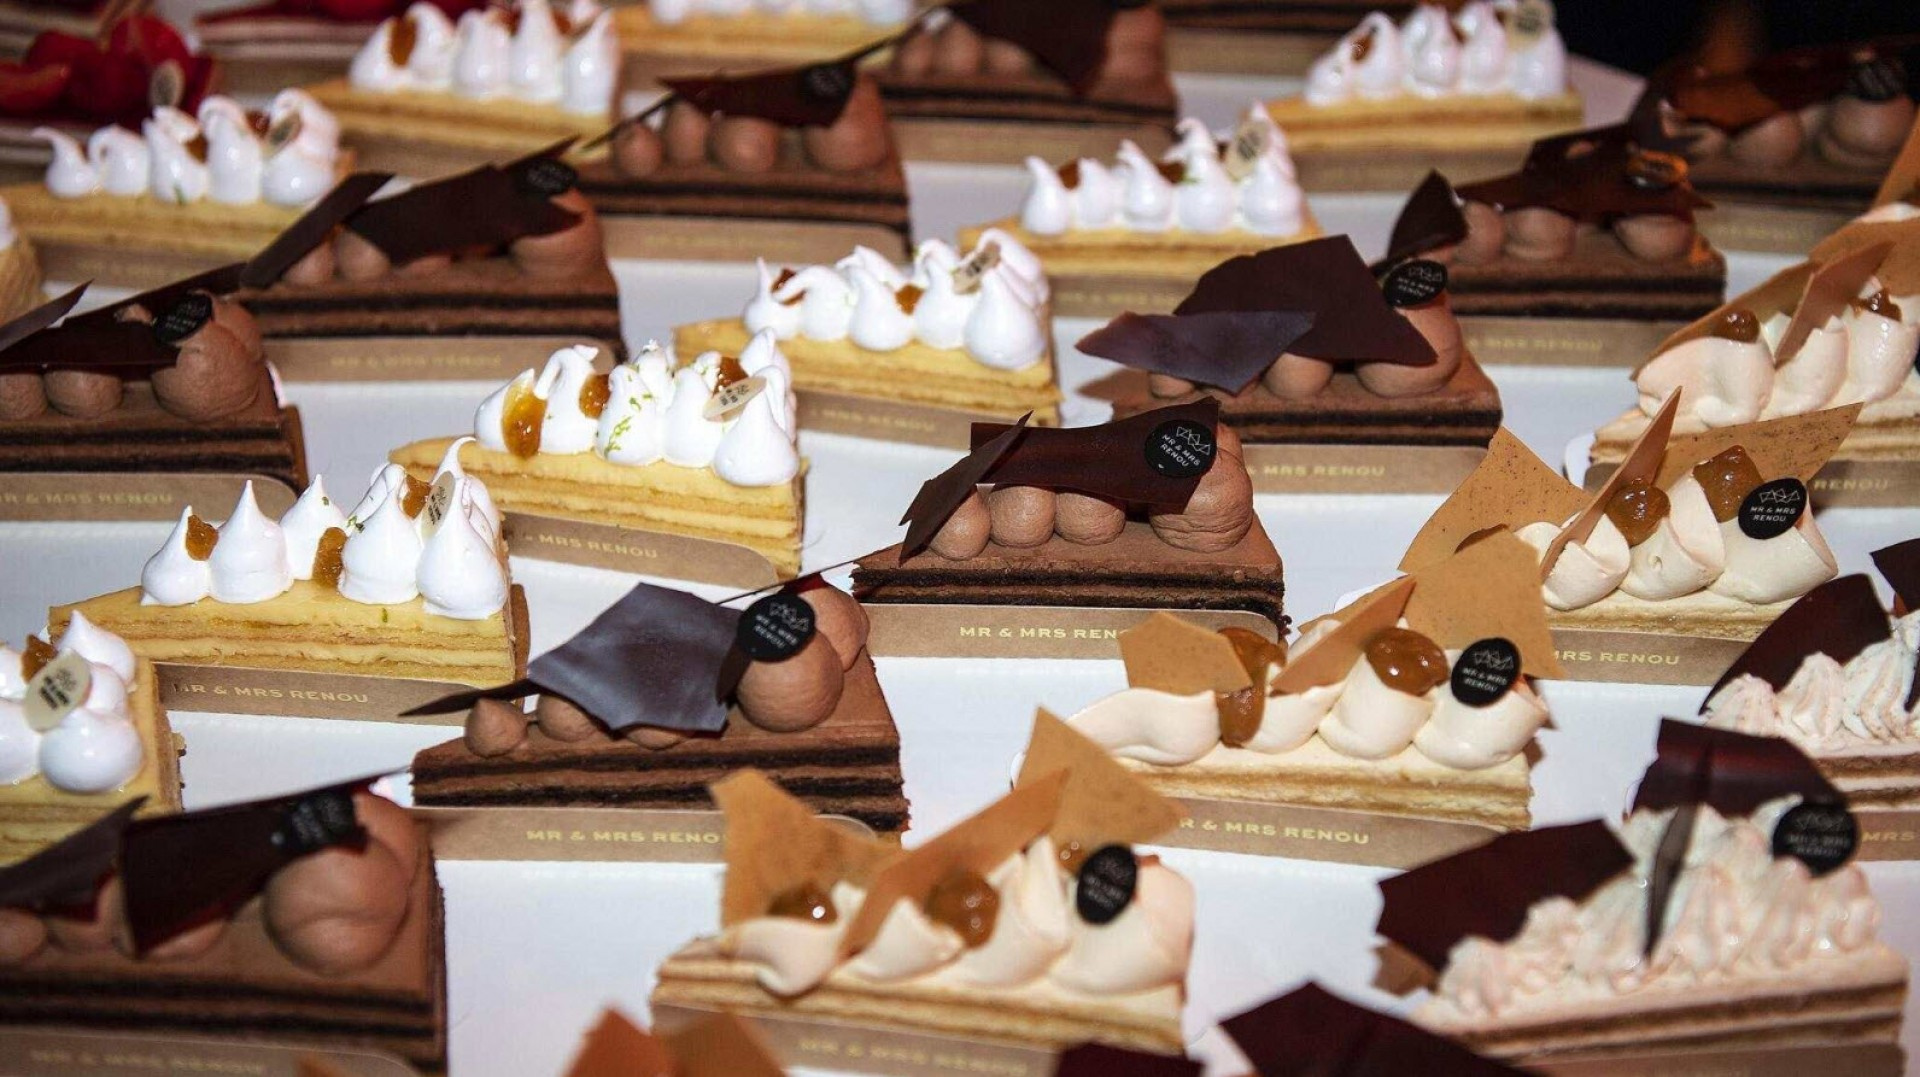 mr et mrs renou geneve chocolat patisserie